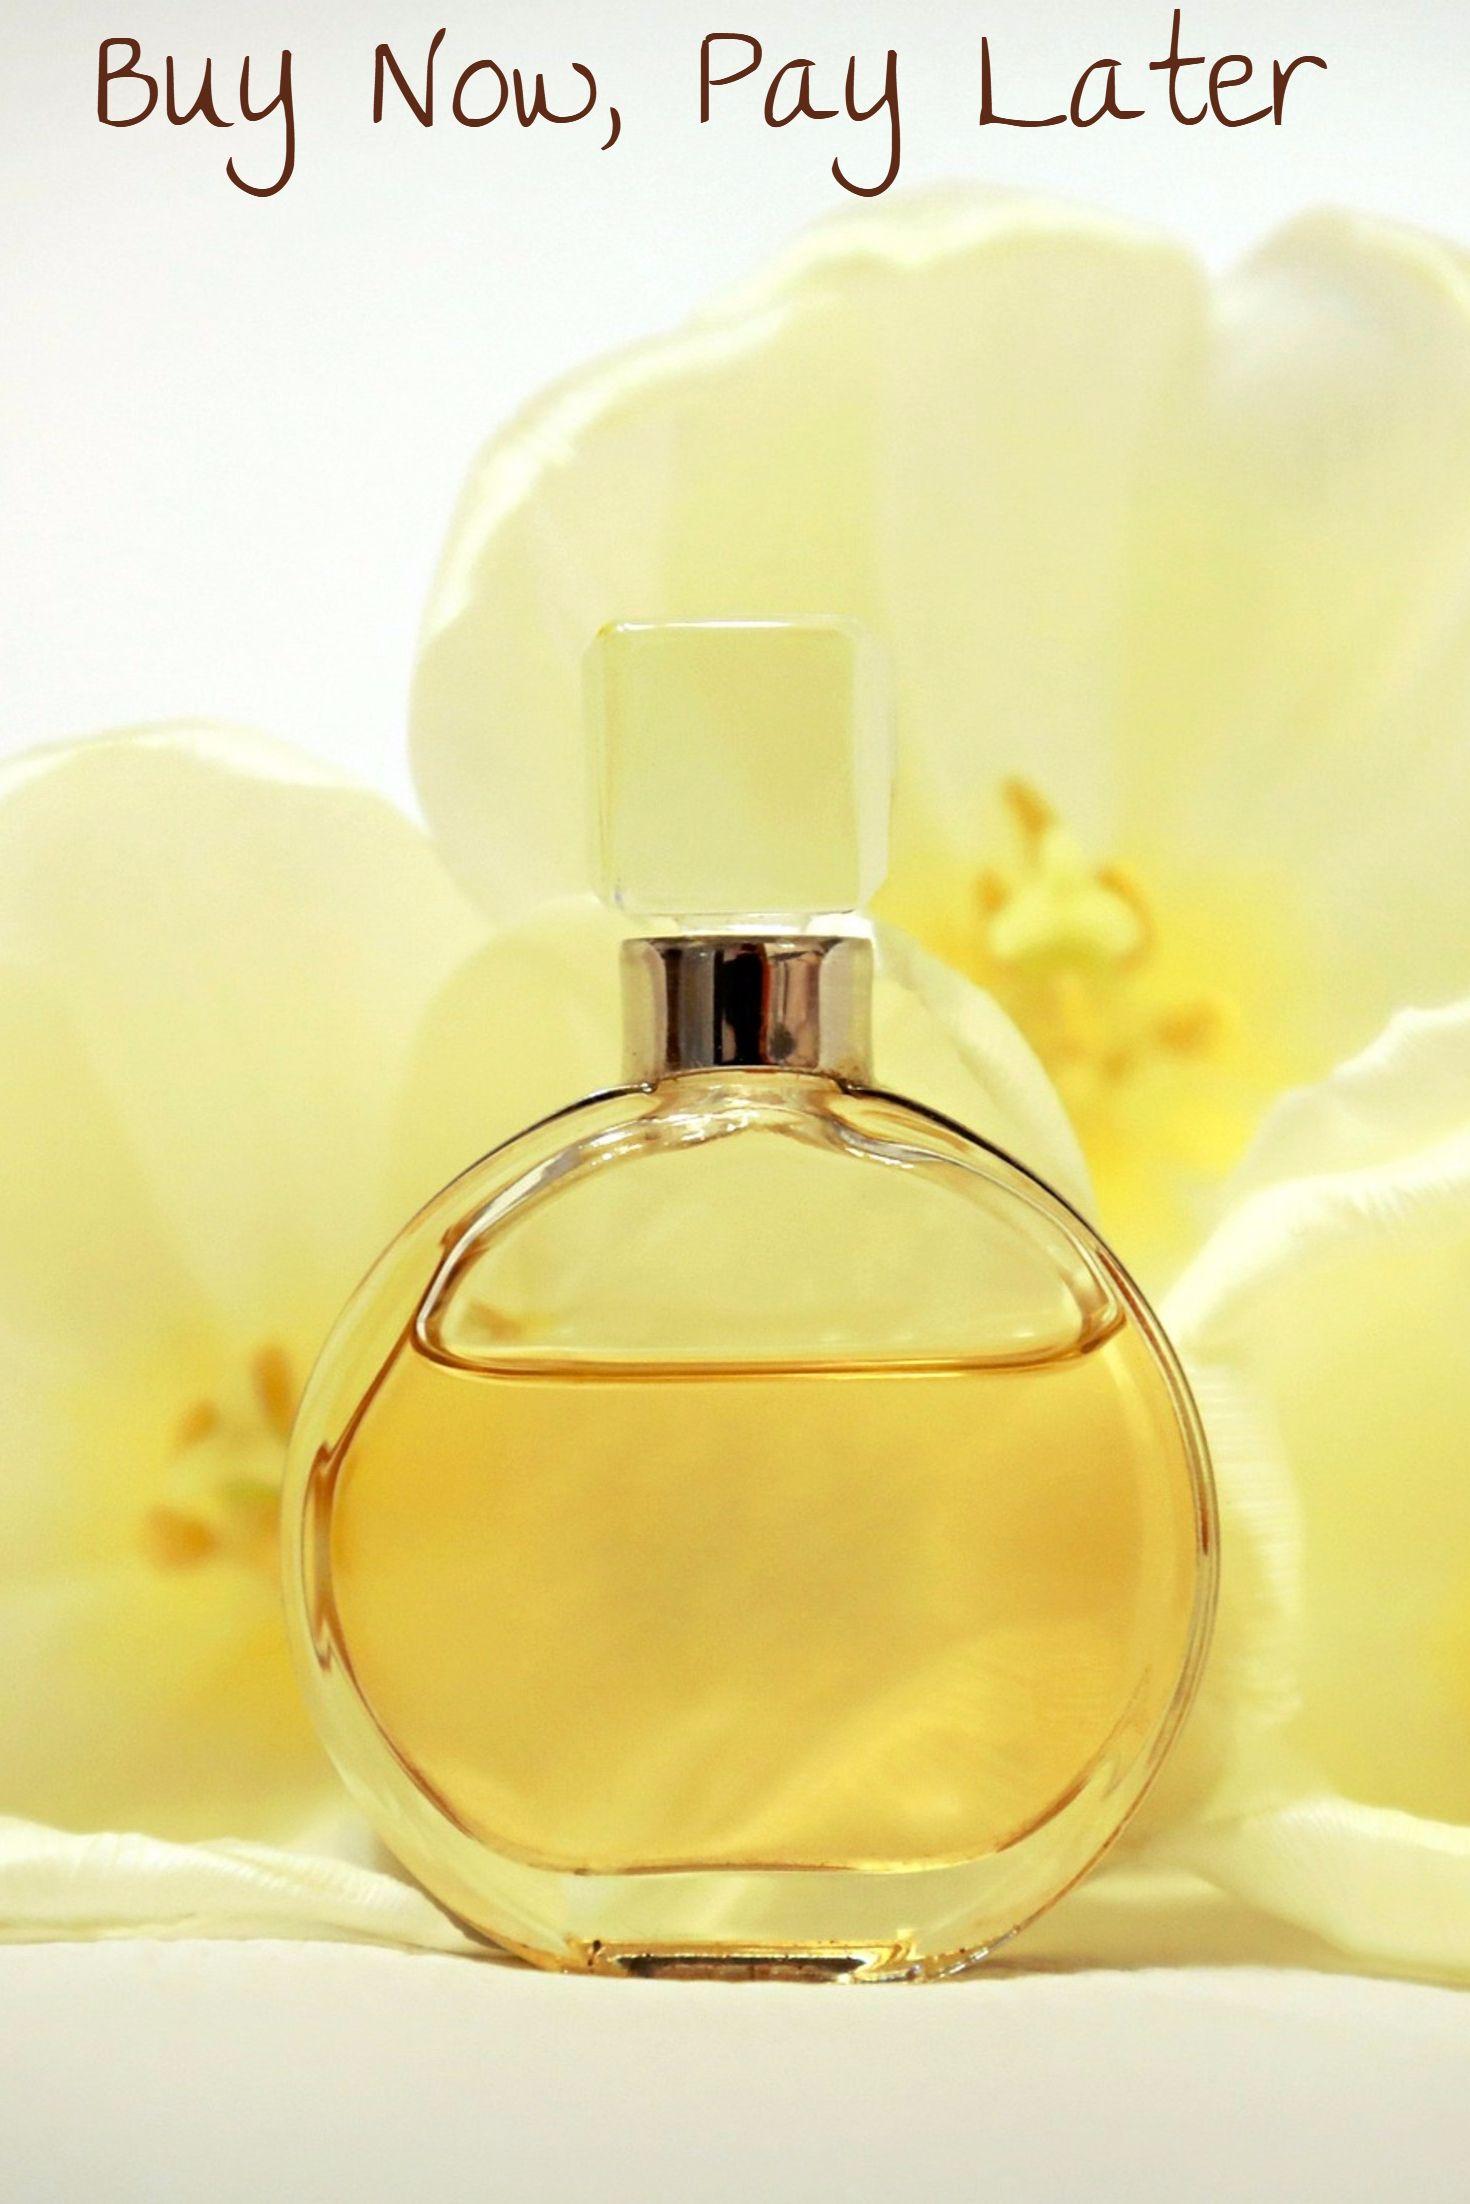 b9cd8309e7a Several online fragrance stores that offer deferred billing